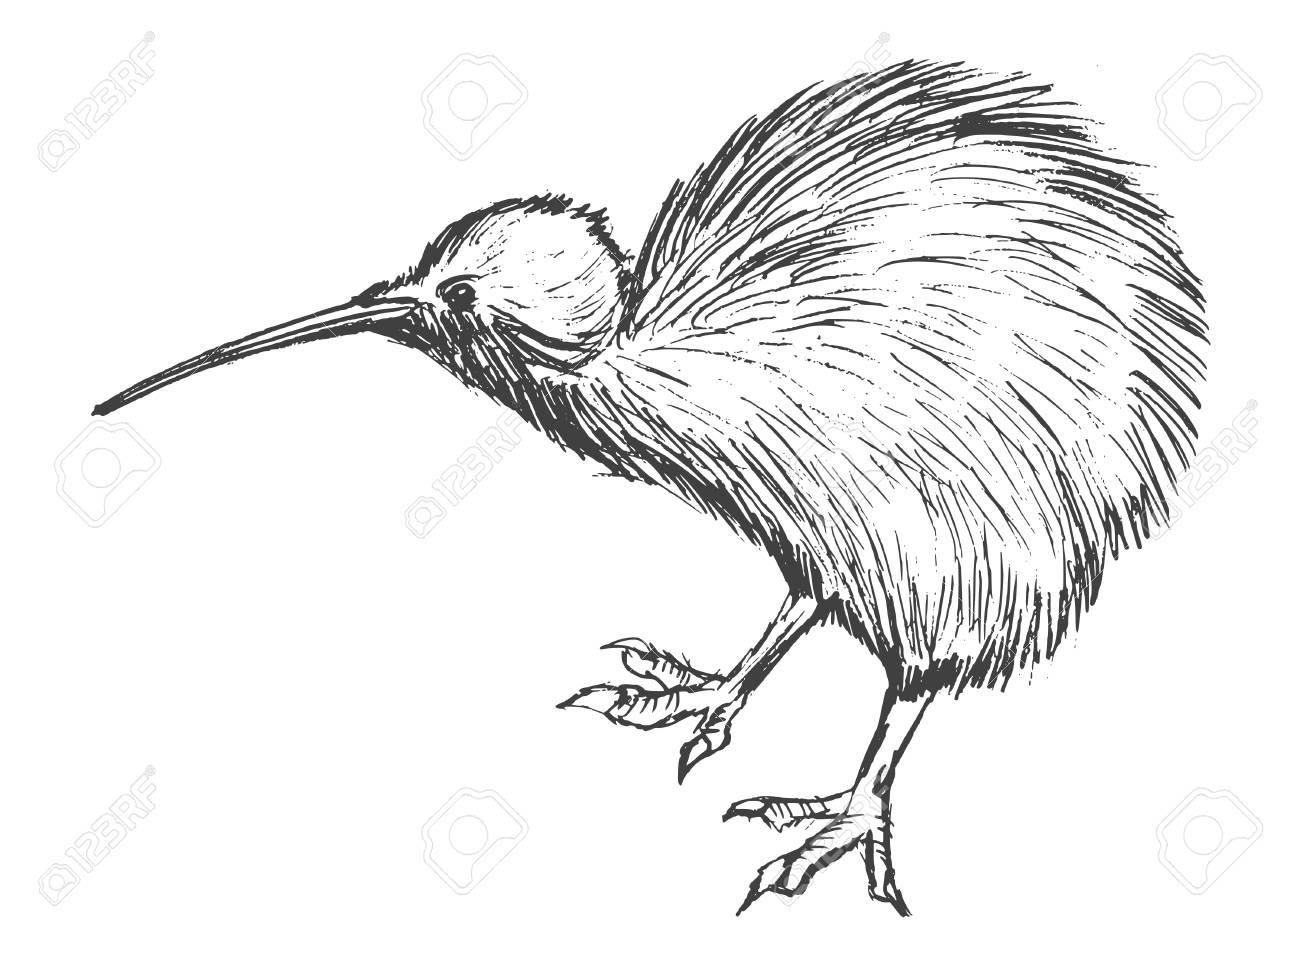 Kiwi Bird Drawing At Getdrawings